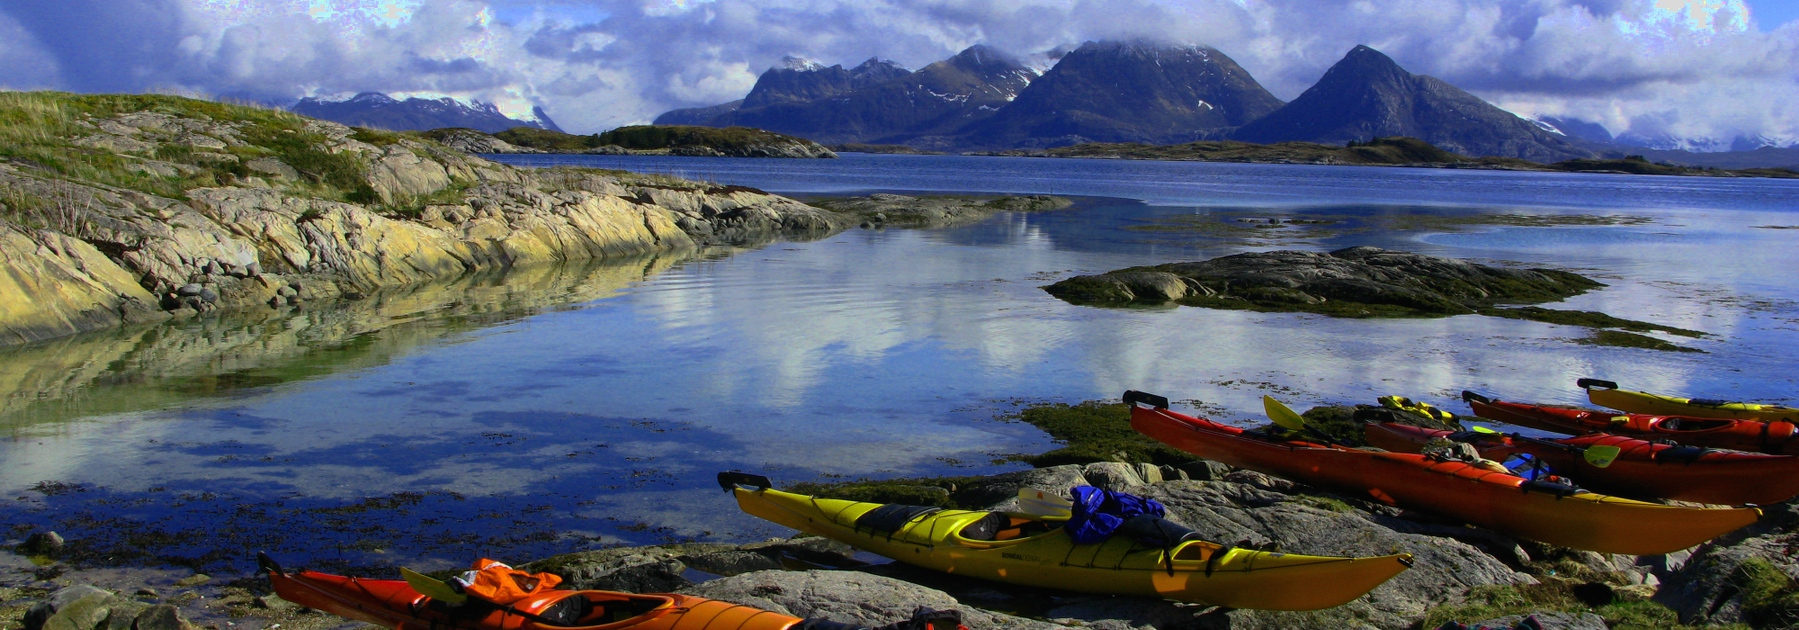 Kajakk Norge 1.jpg